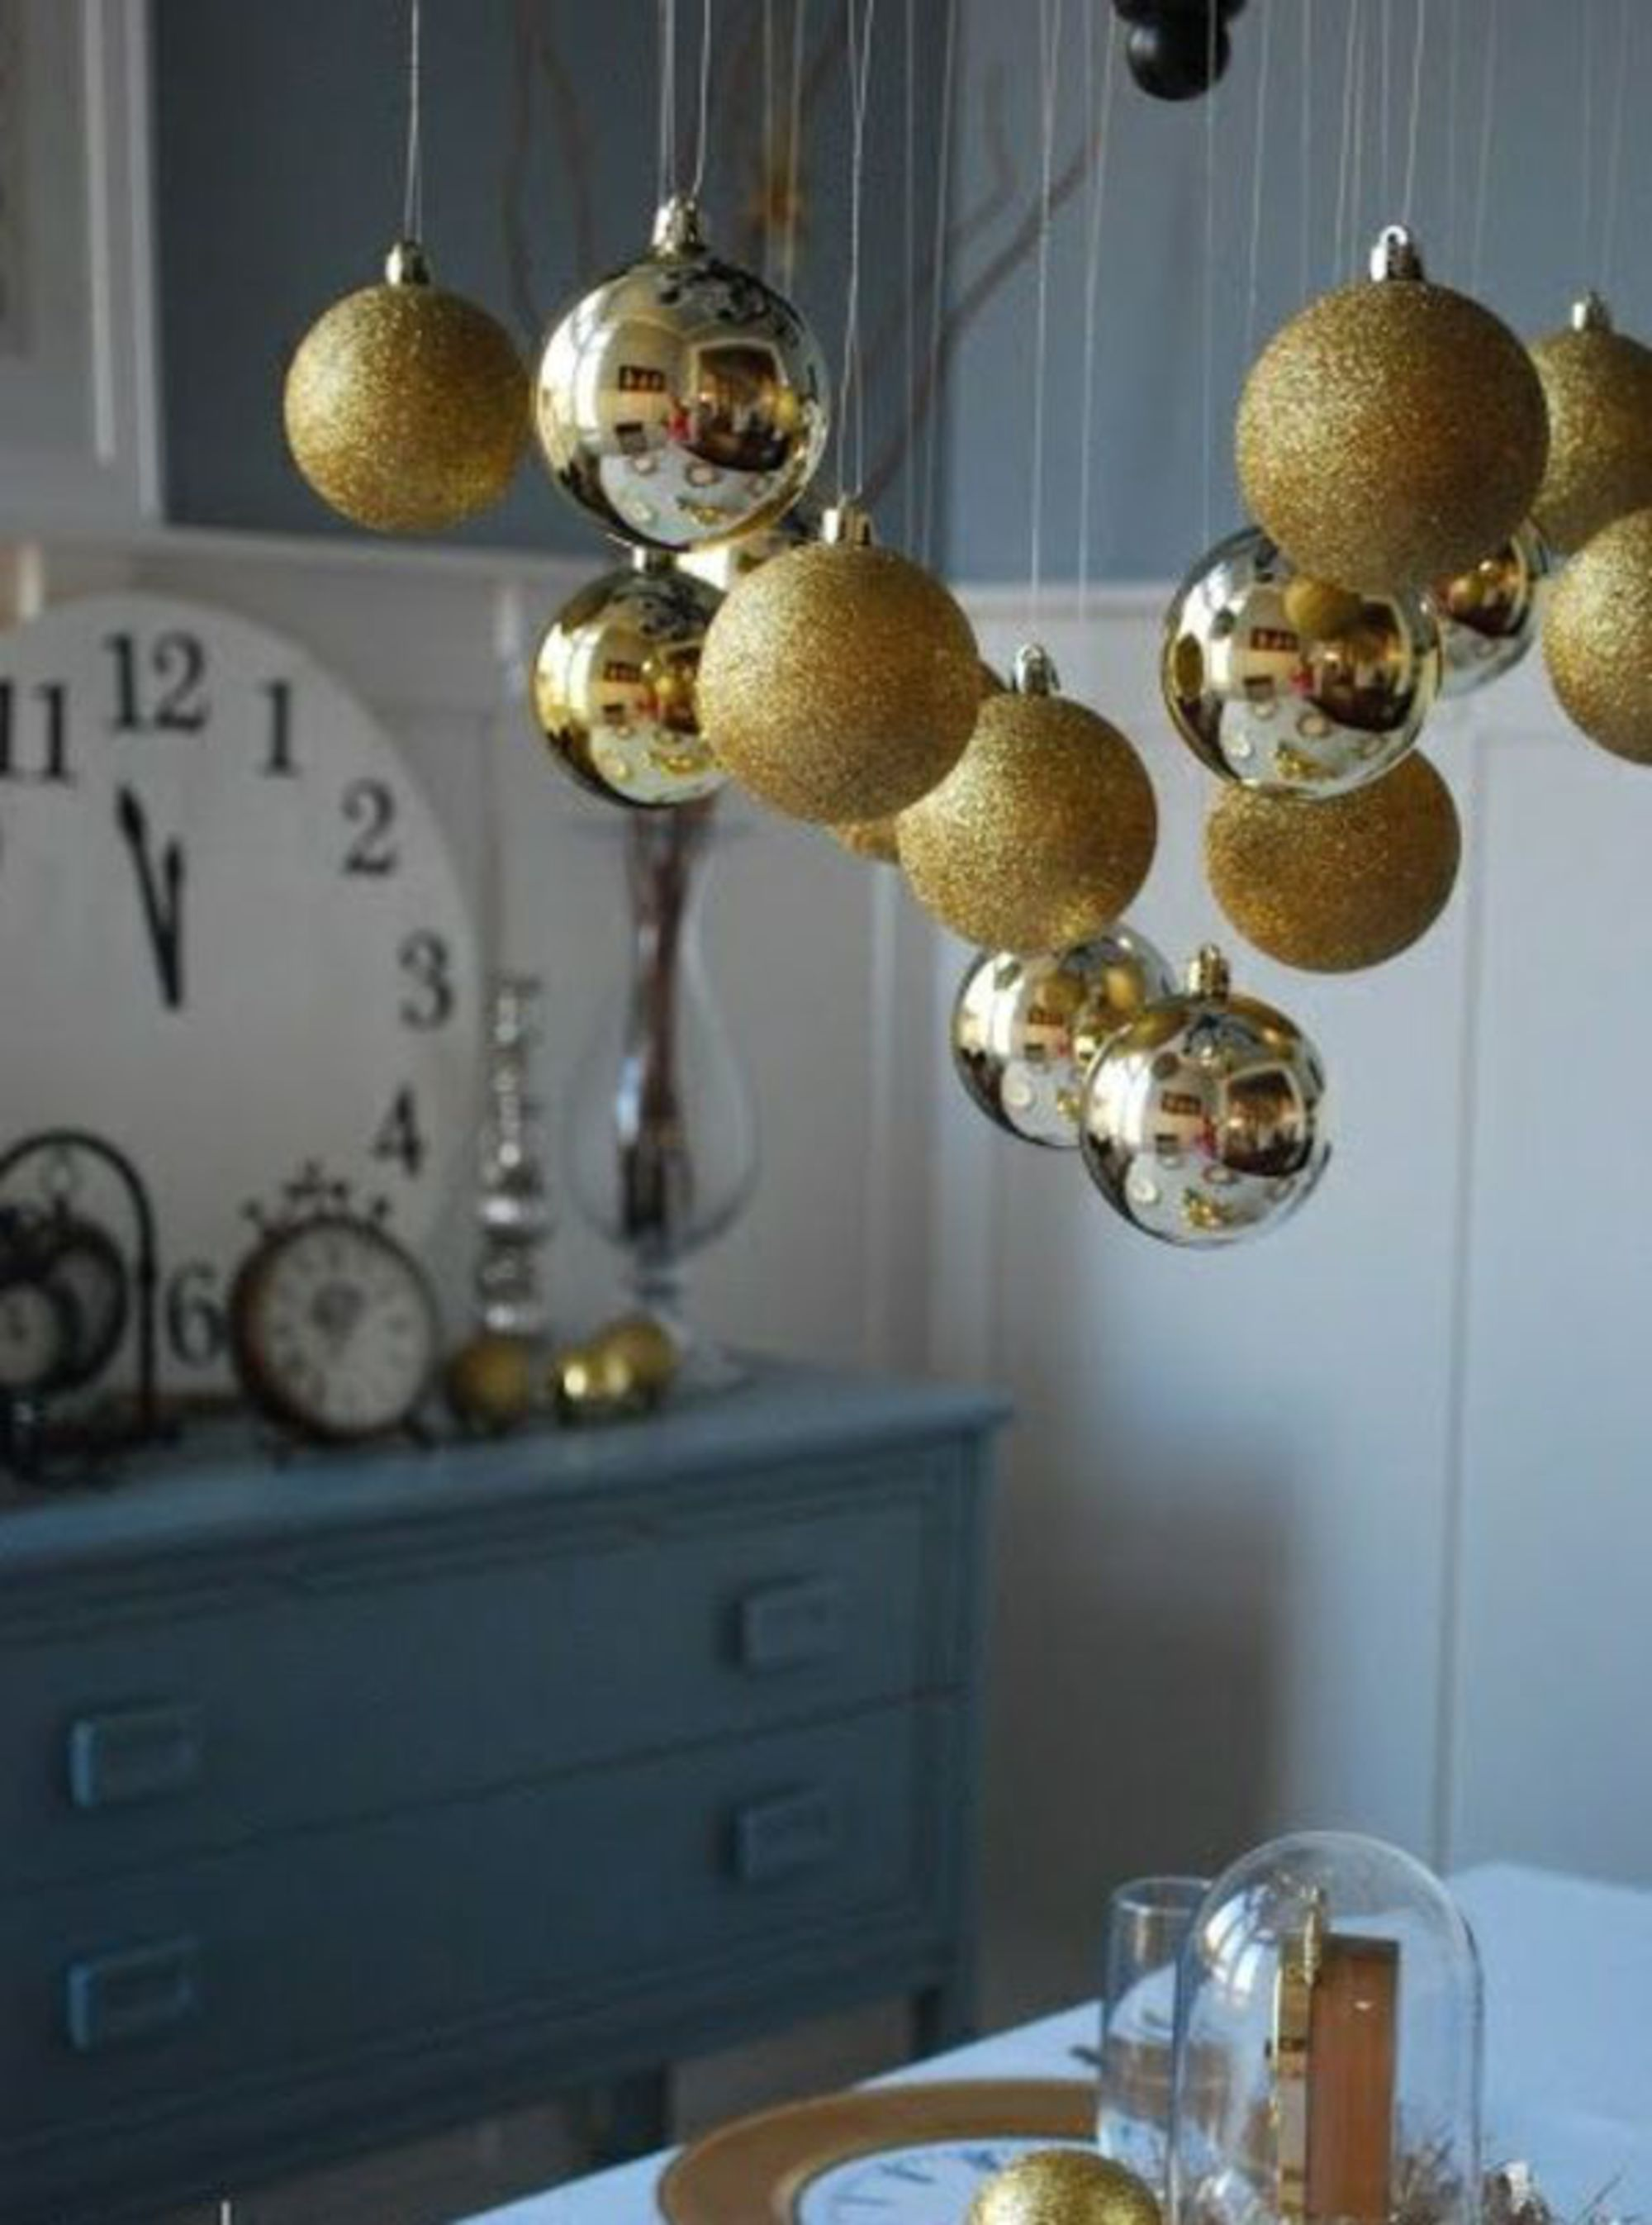 Ideias para decorar casa e mesa para o Ano Novo  10 - Ideias para decorar casa e mesa para o Ano Novo